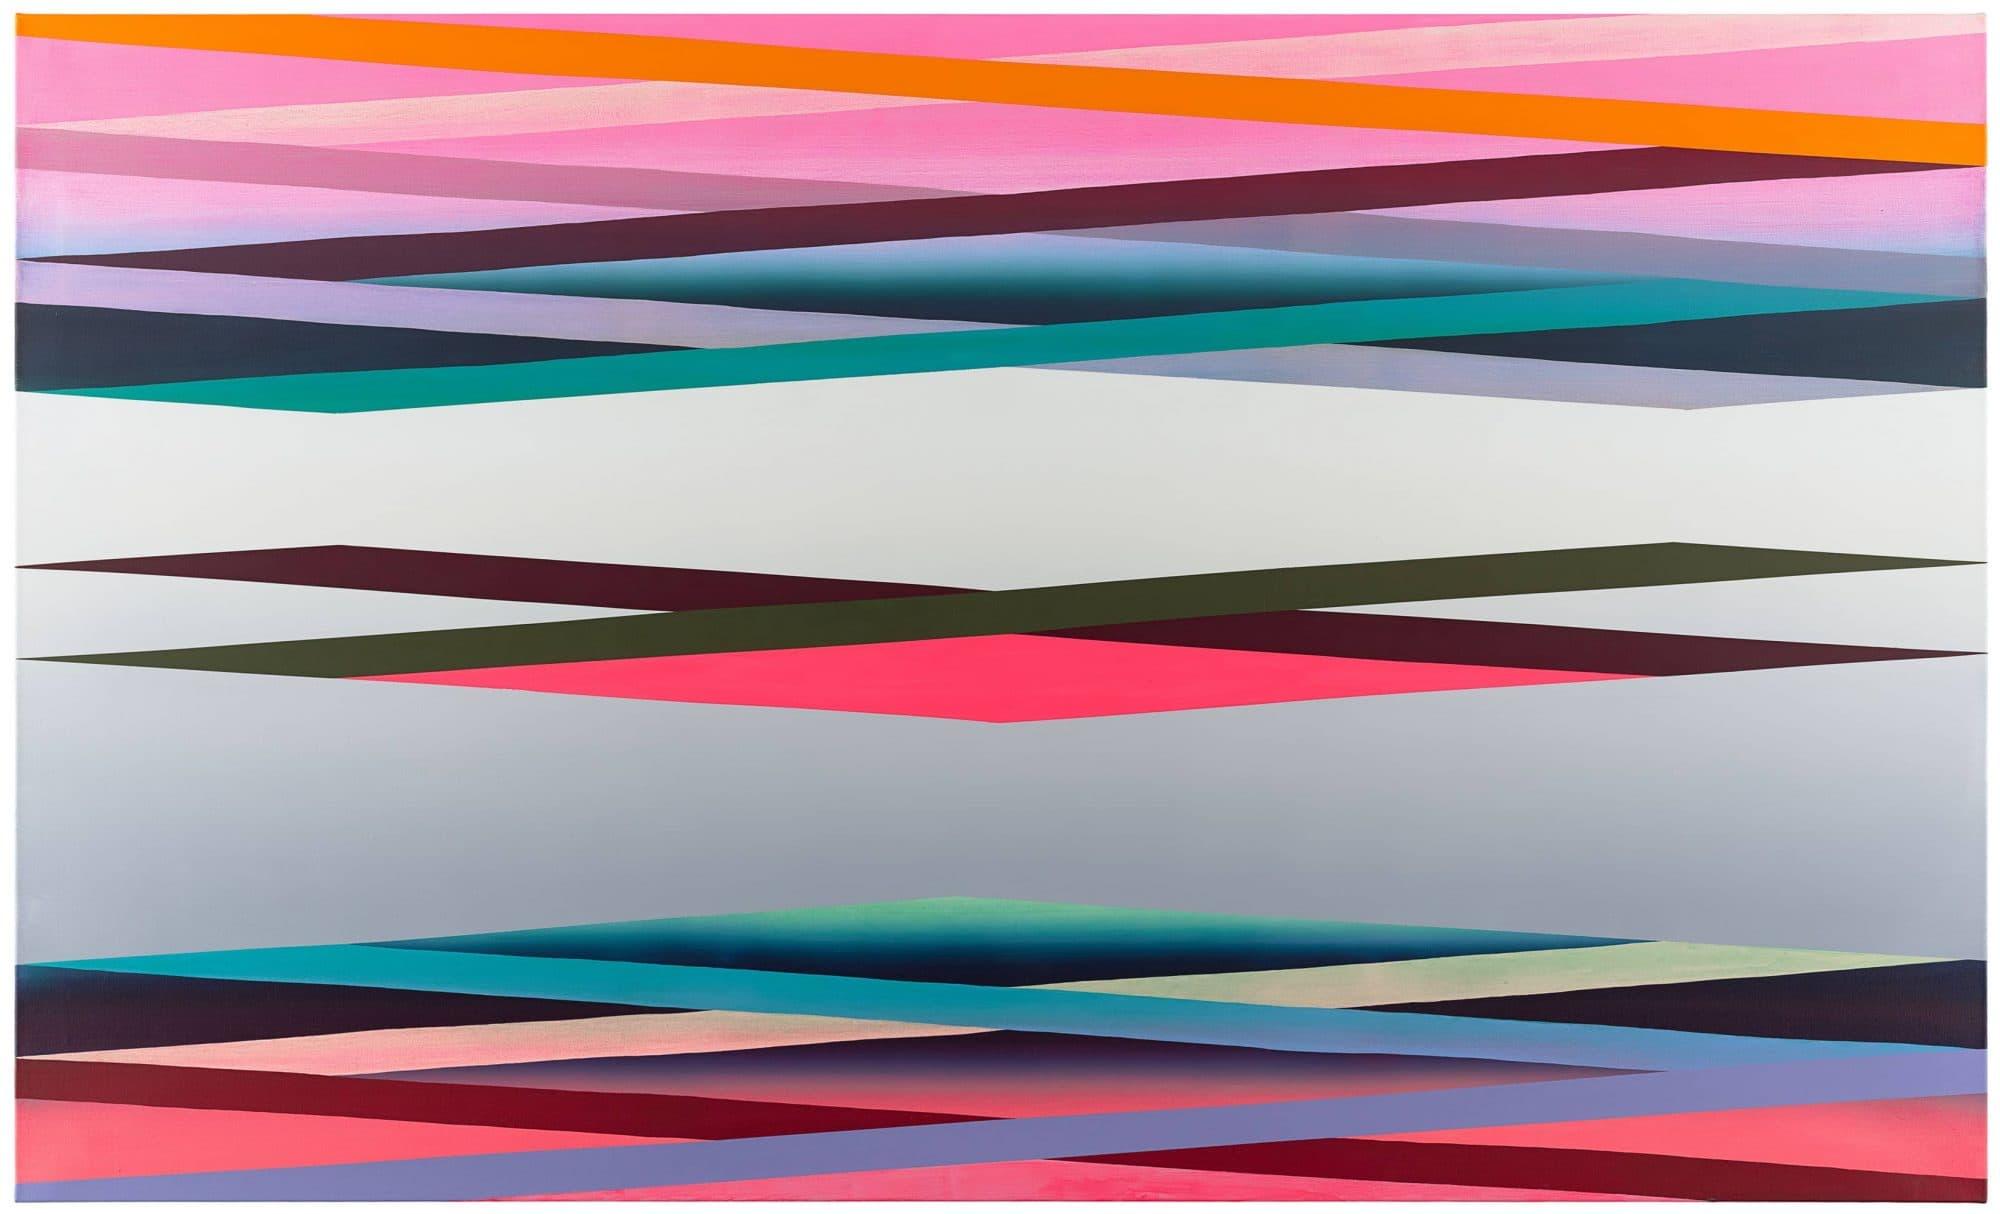 Acryl auf Leinwand 150x250cm 2010-2014